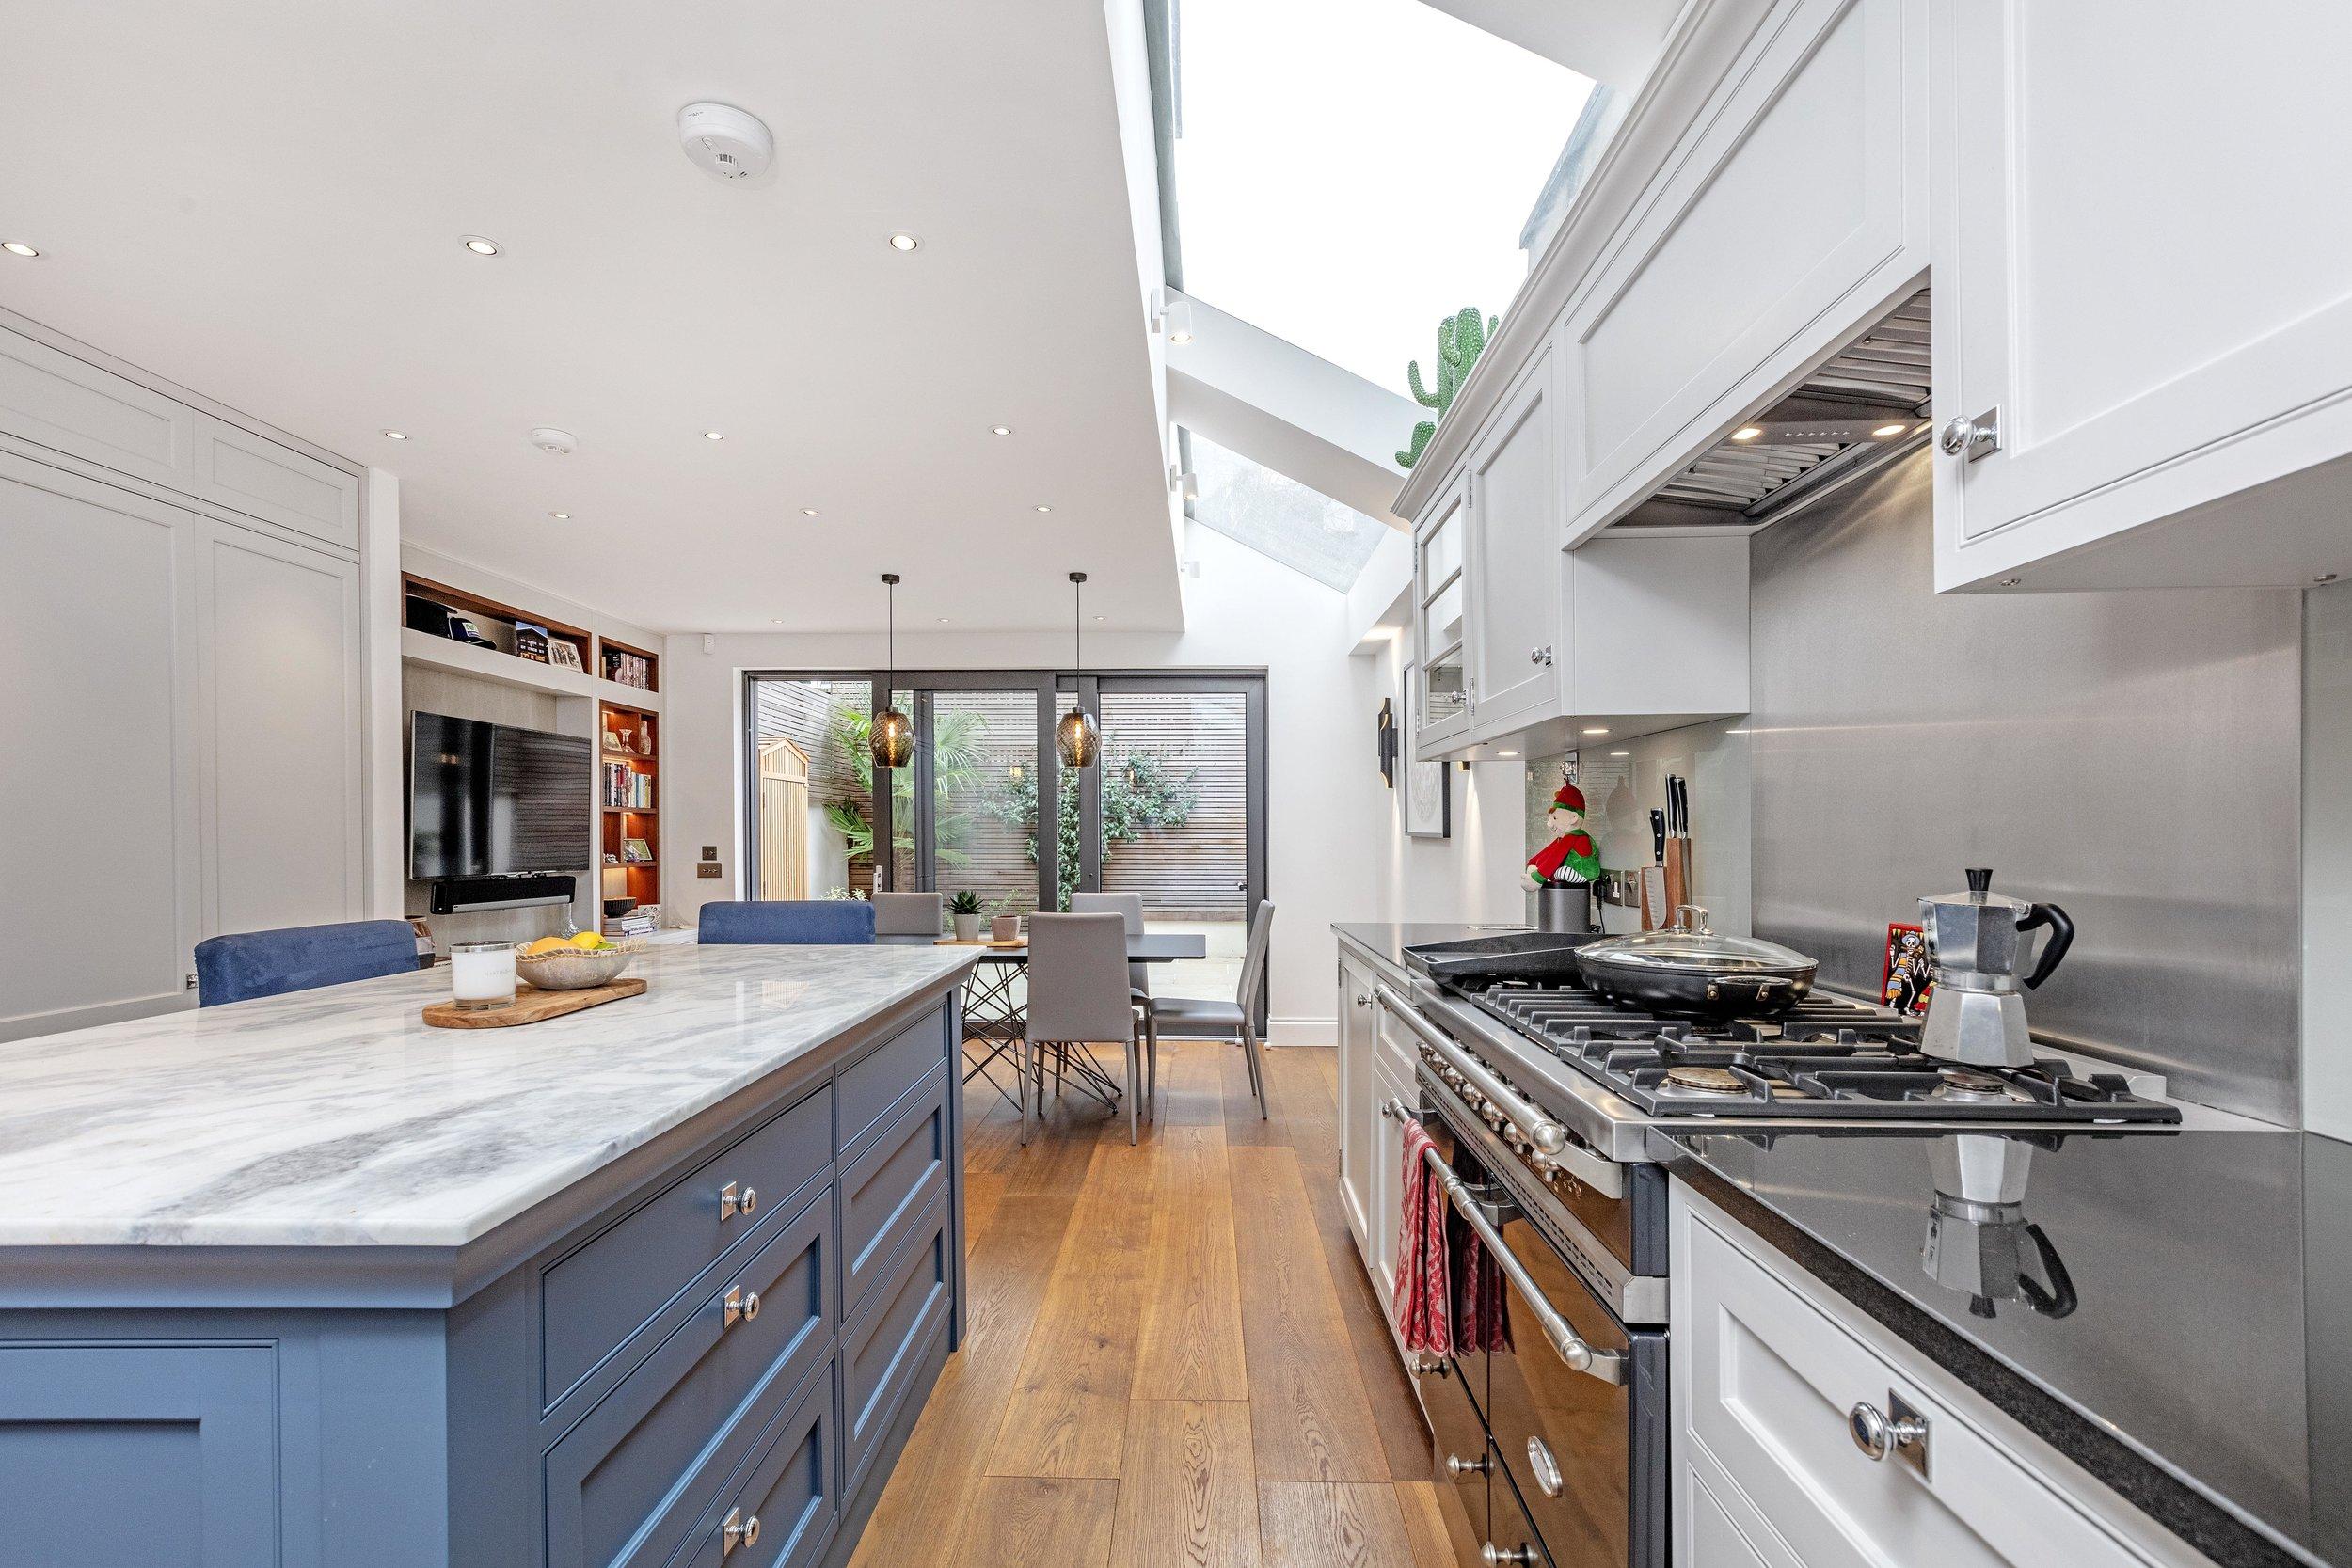 west-london-interior-designers.jpg